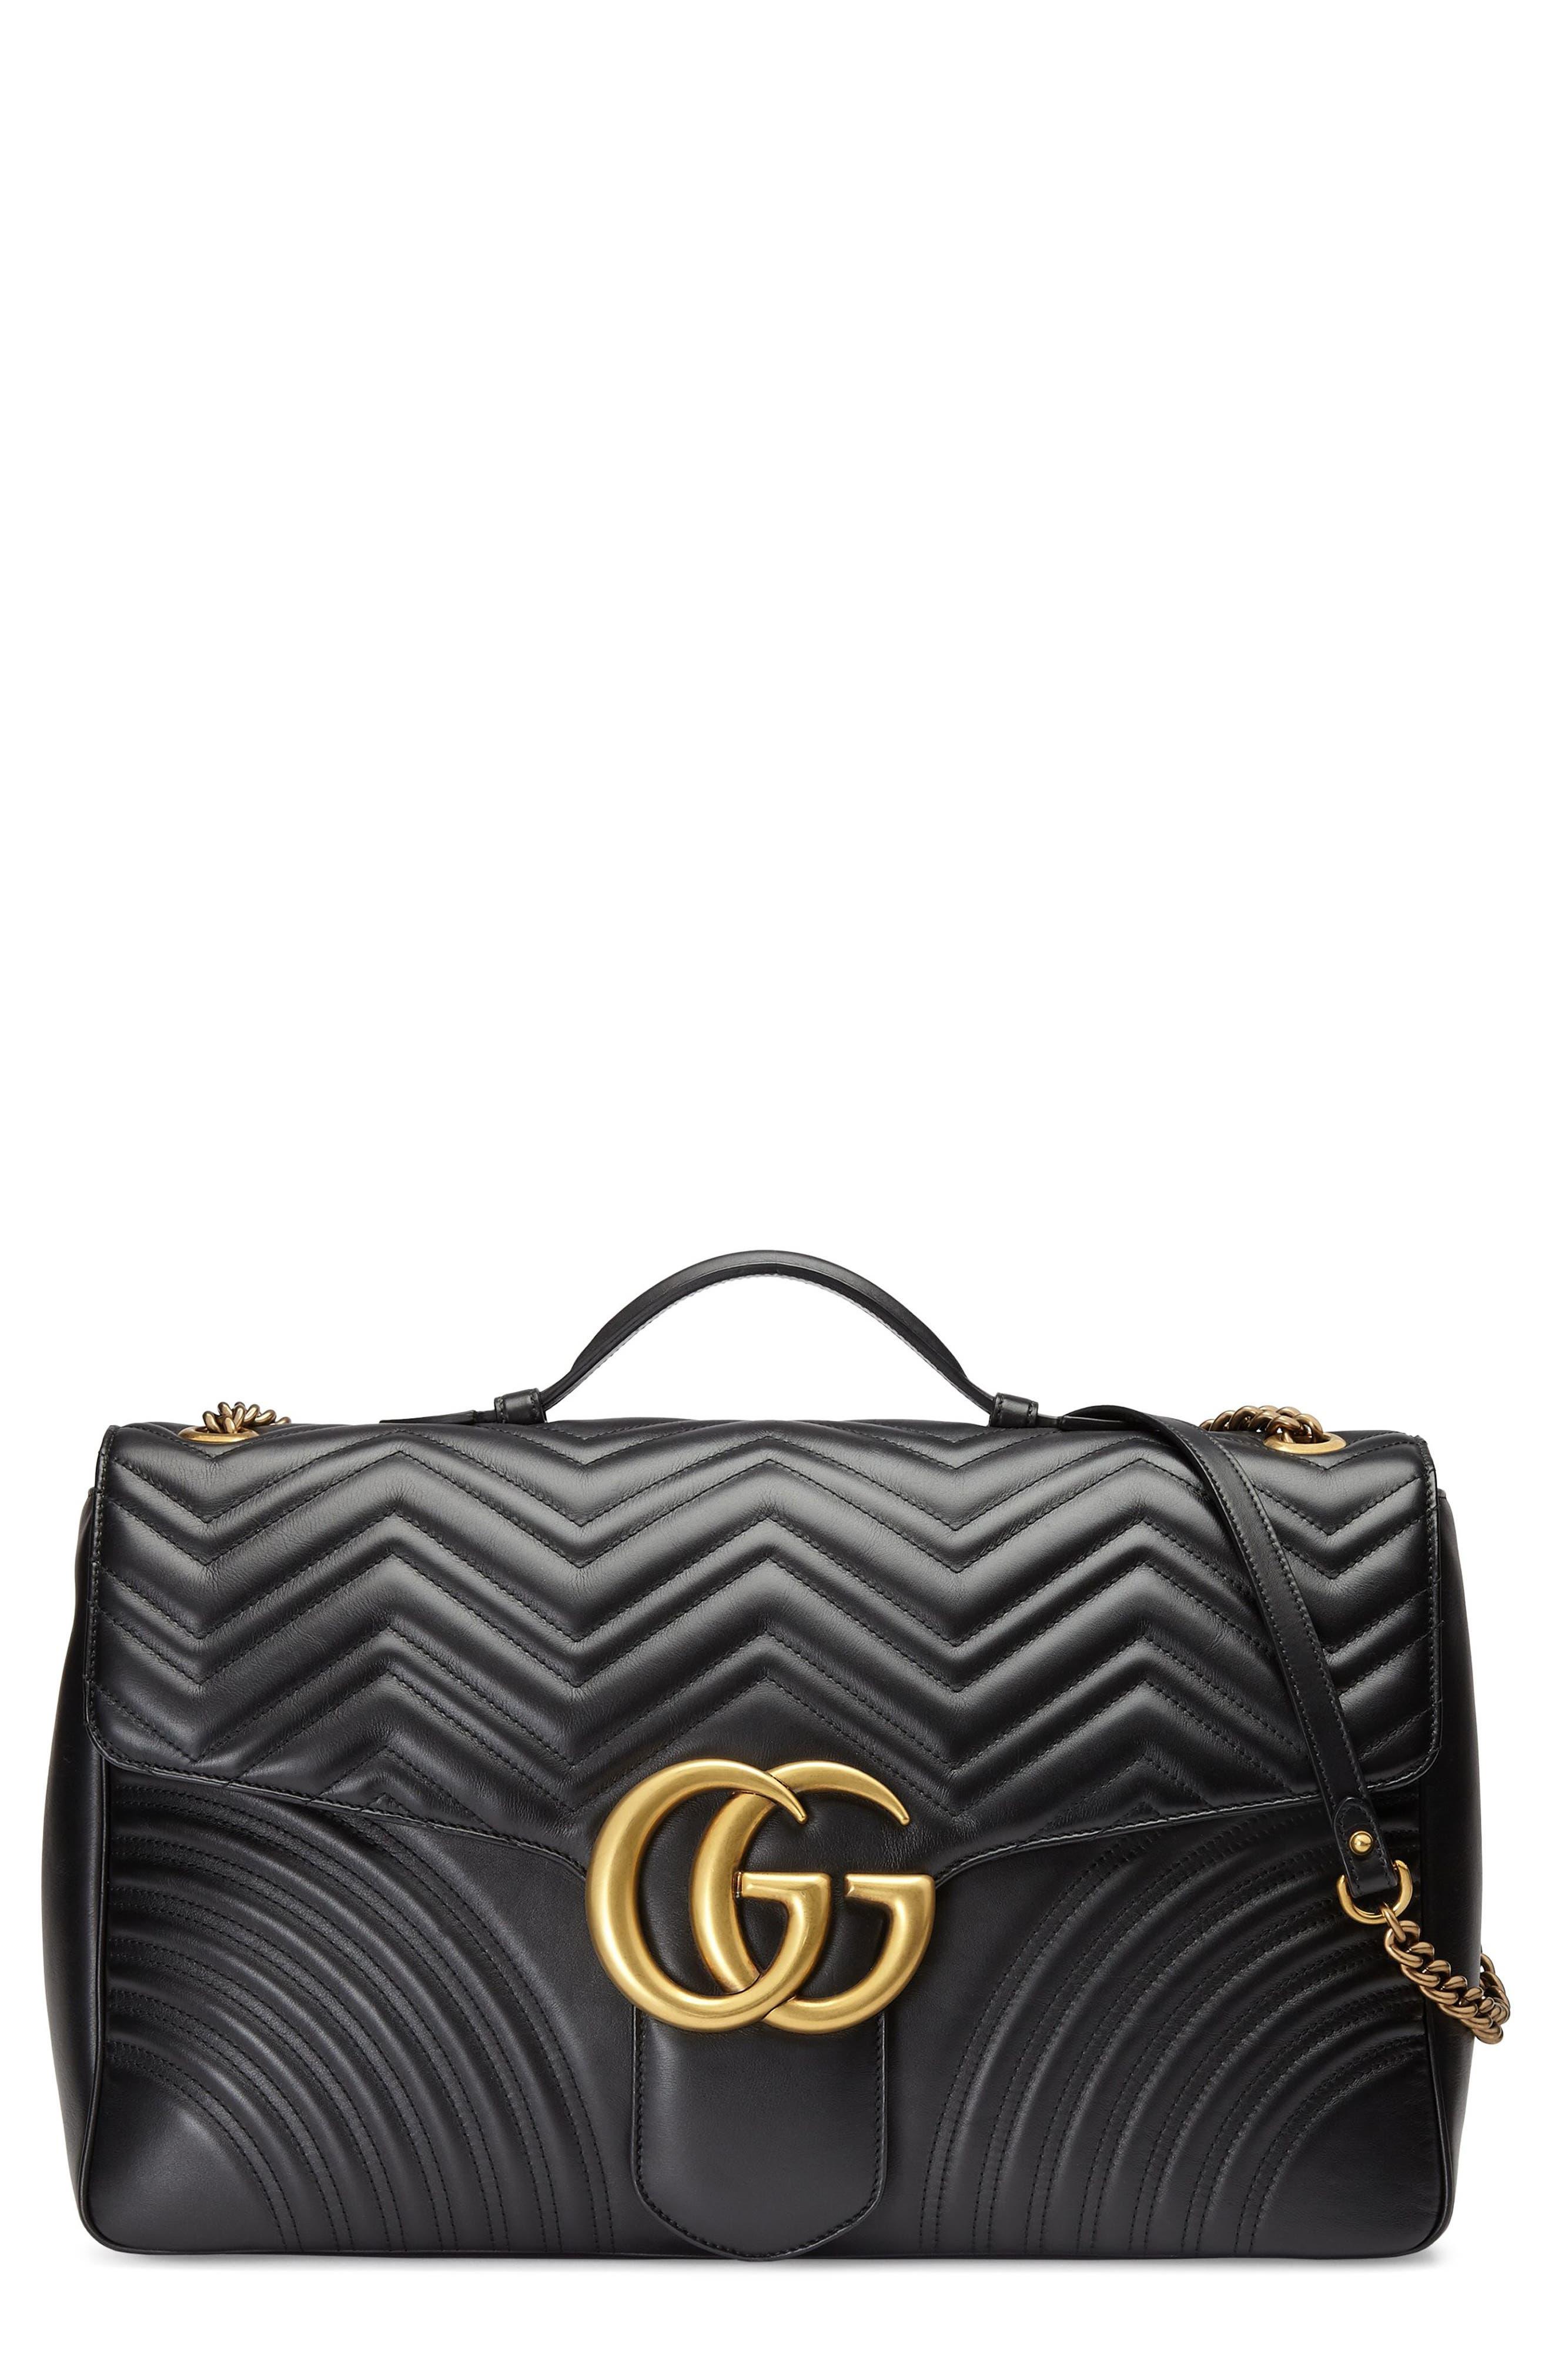 GG Marmont Maxi Matelassé Top Handle Shoulder Bag,                         Main,                         color, Nero